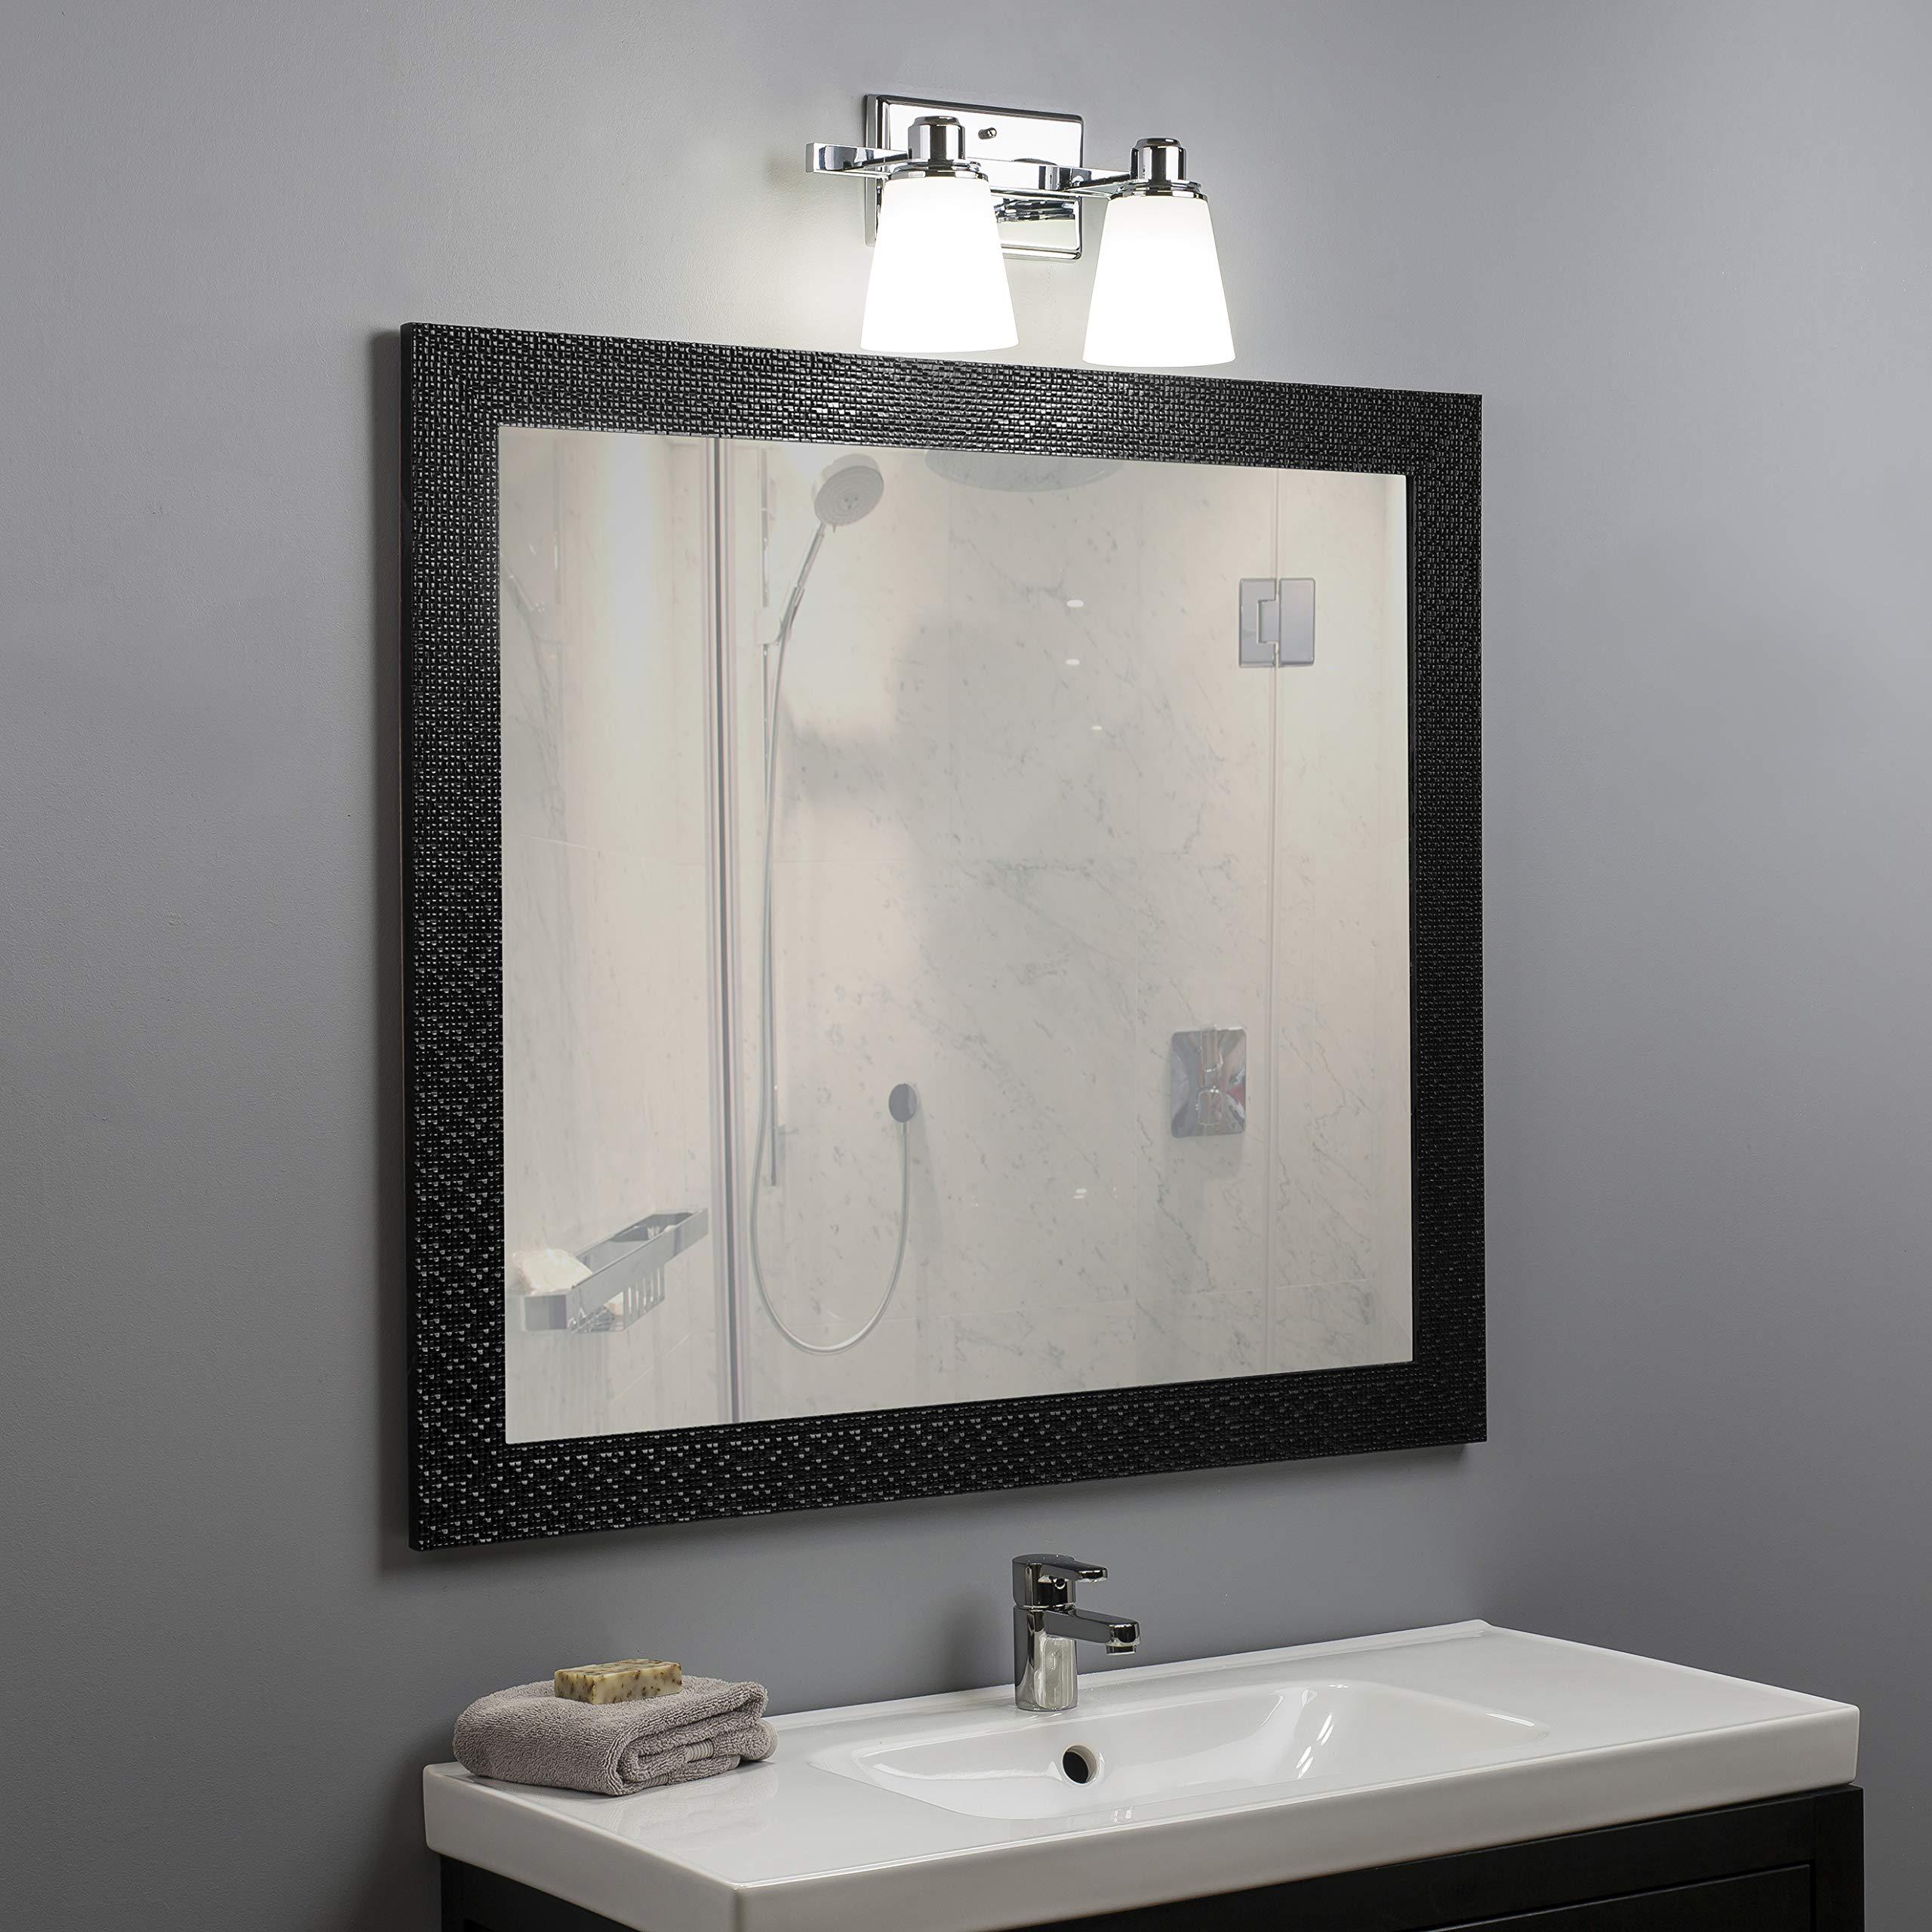 Terracina Two-Light Vanity Sconce Lamp, Polished Chrome with Opal Glass Linea di Liara LL-WL220-2 by Linea di Liara (Image #4)